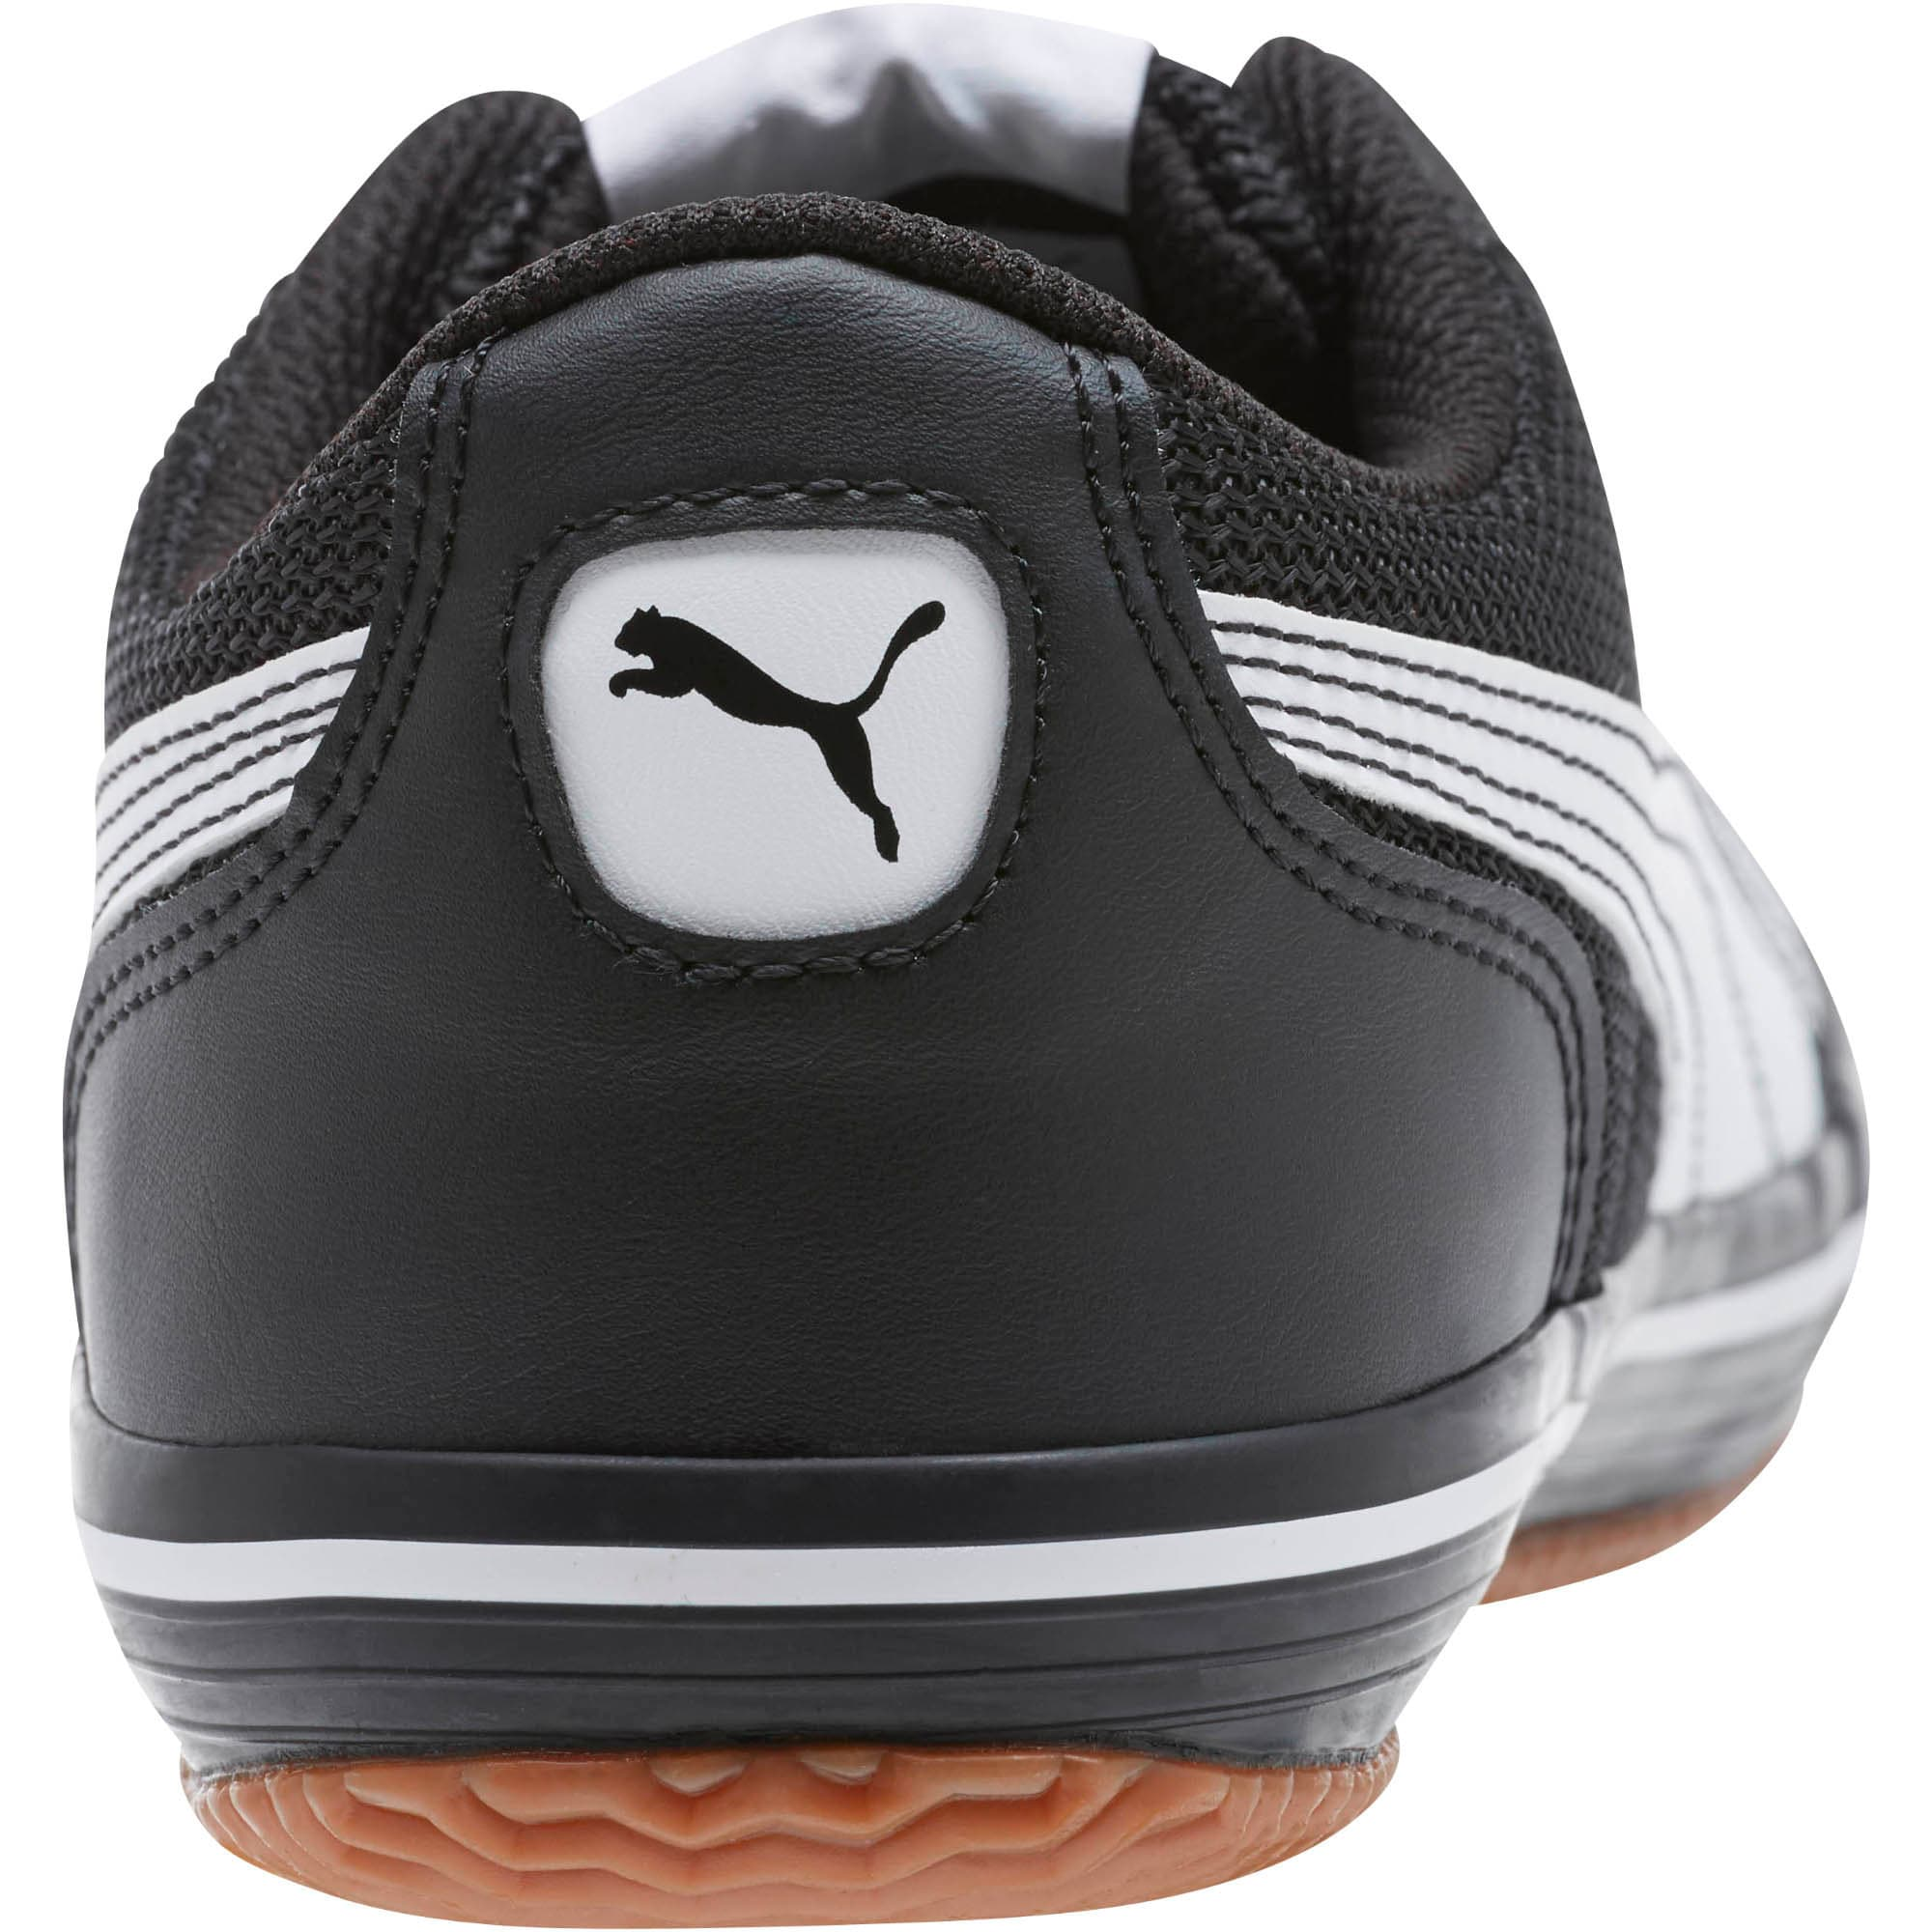 Thumbnail 4 of Astro Sala Sneakers, Puma Black-Puma White, medium